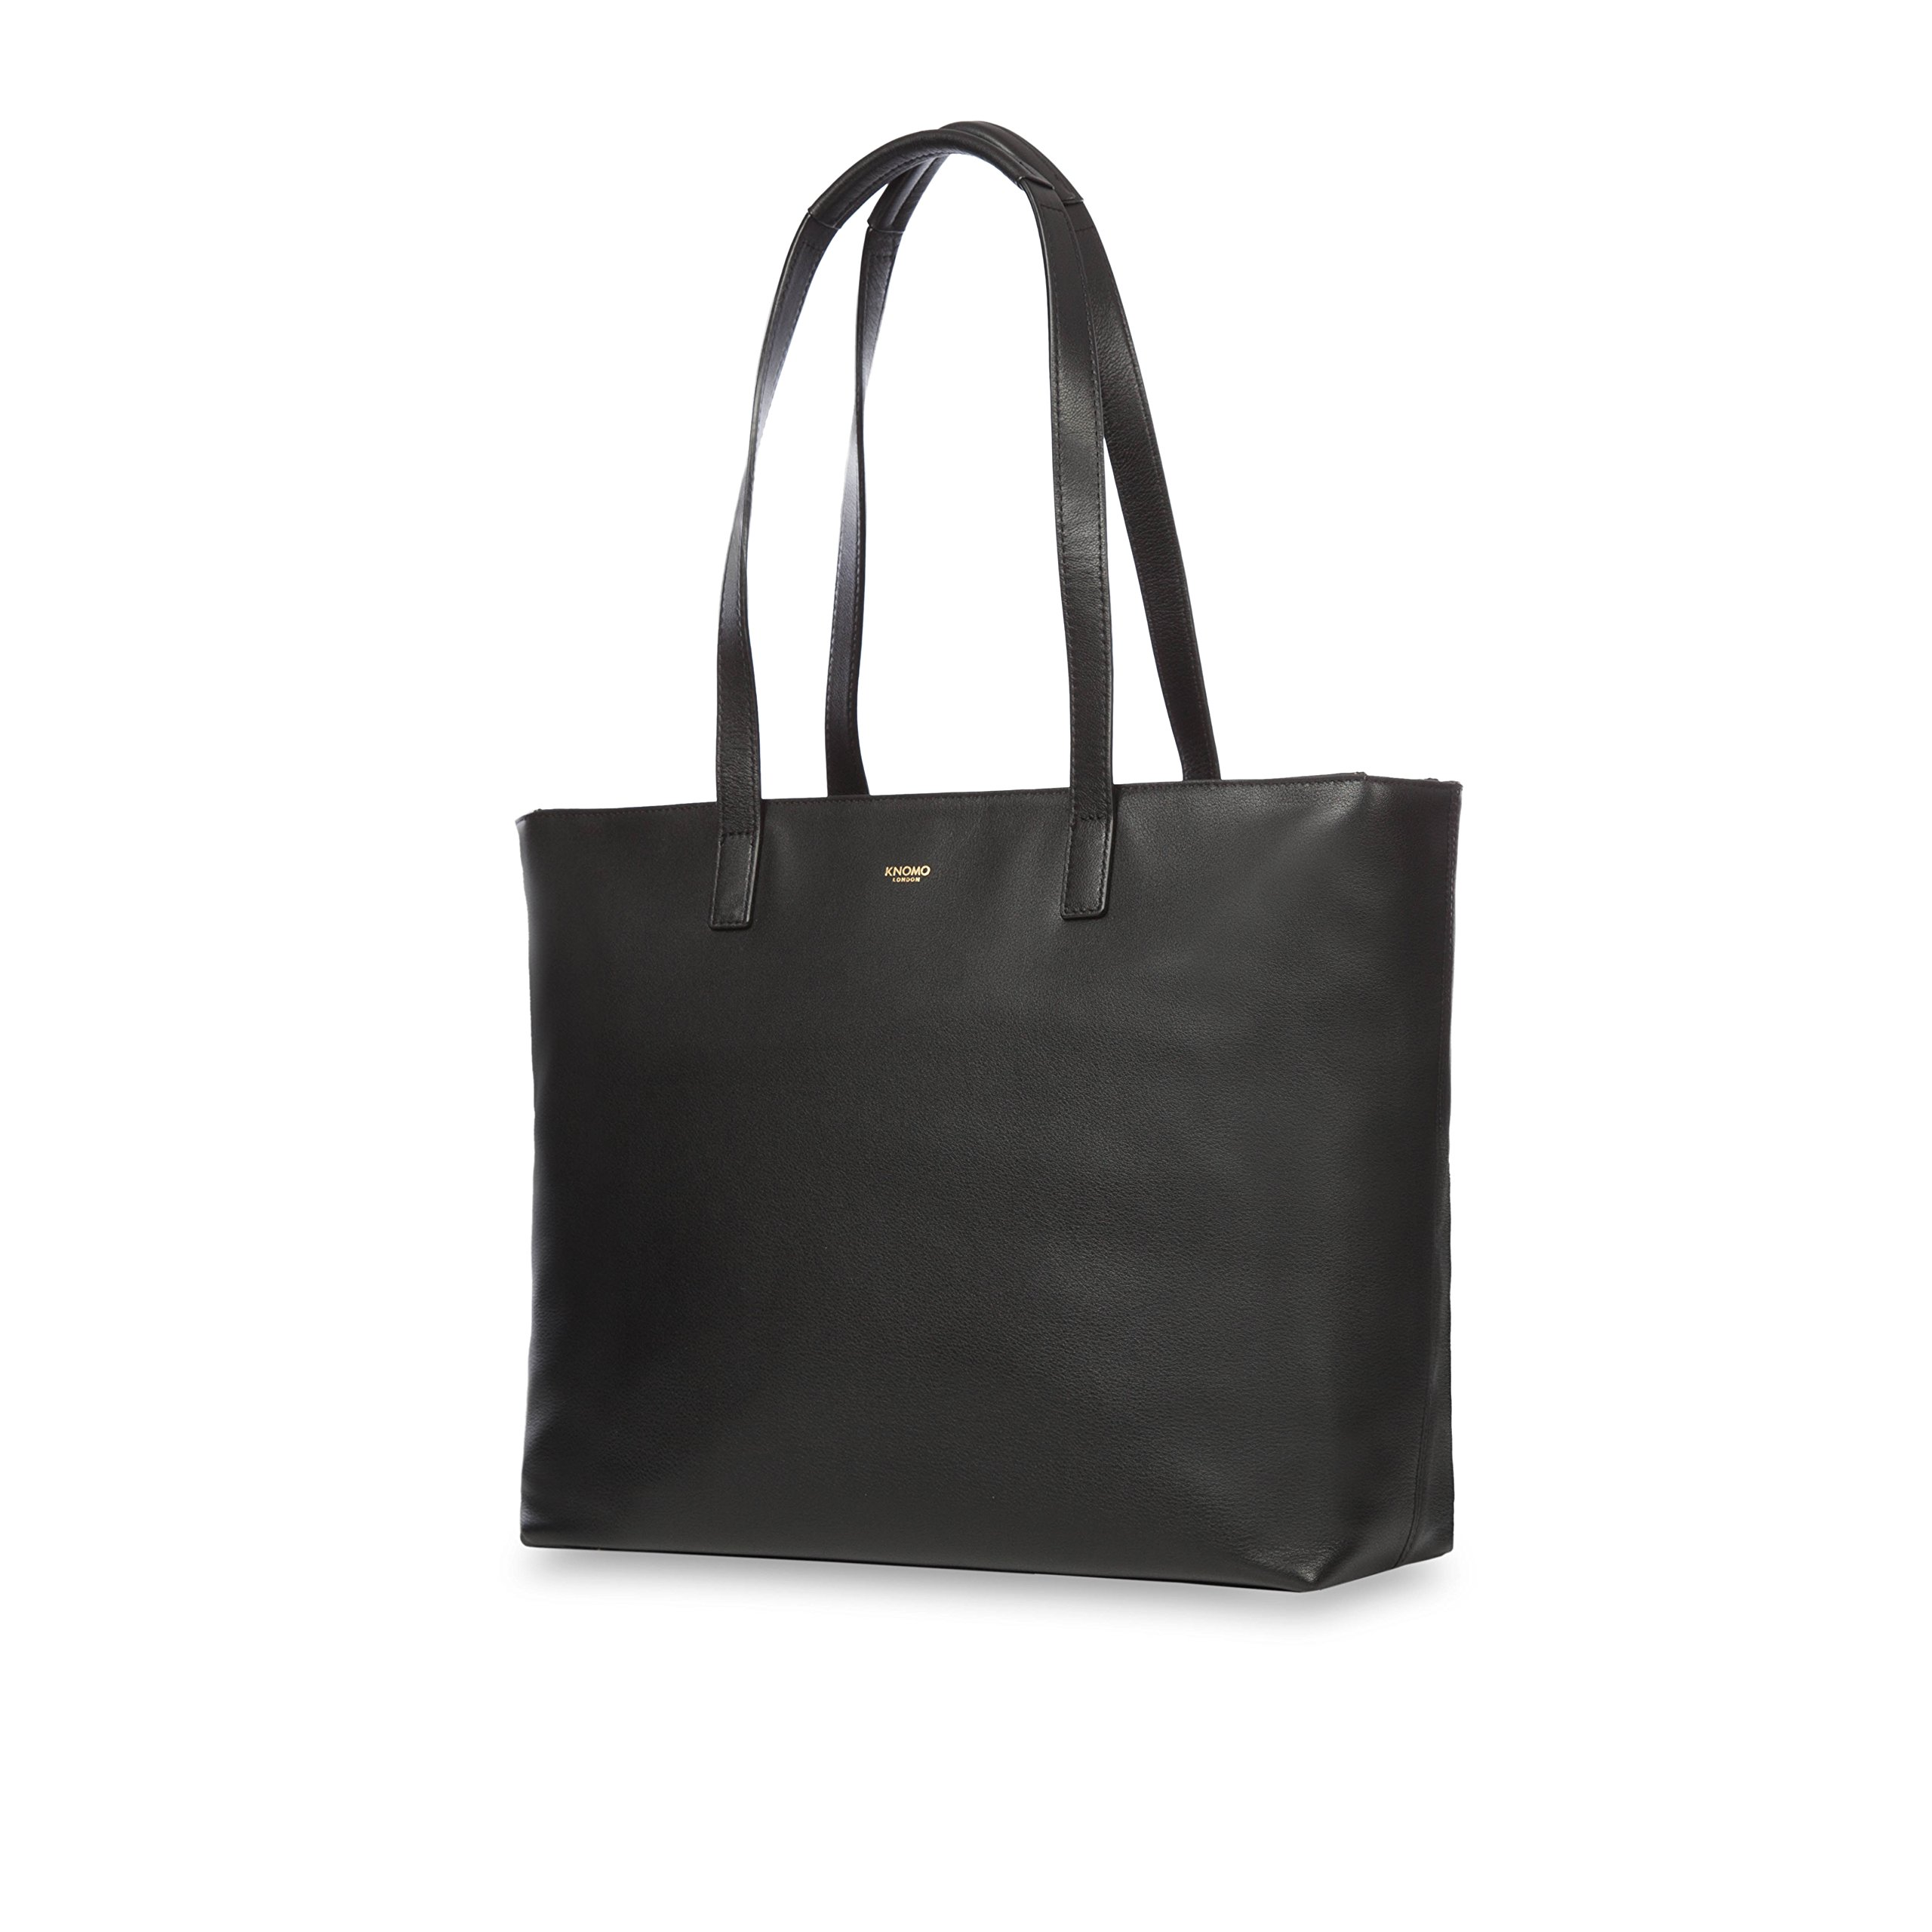 Knomo Luggage Women's Maddox Travel Shoulder Bag, Black, One Size by Knomo